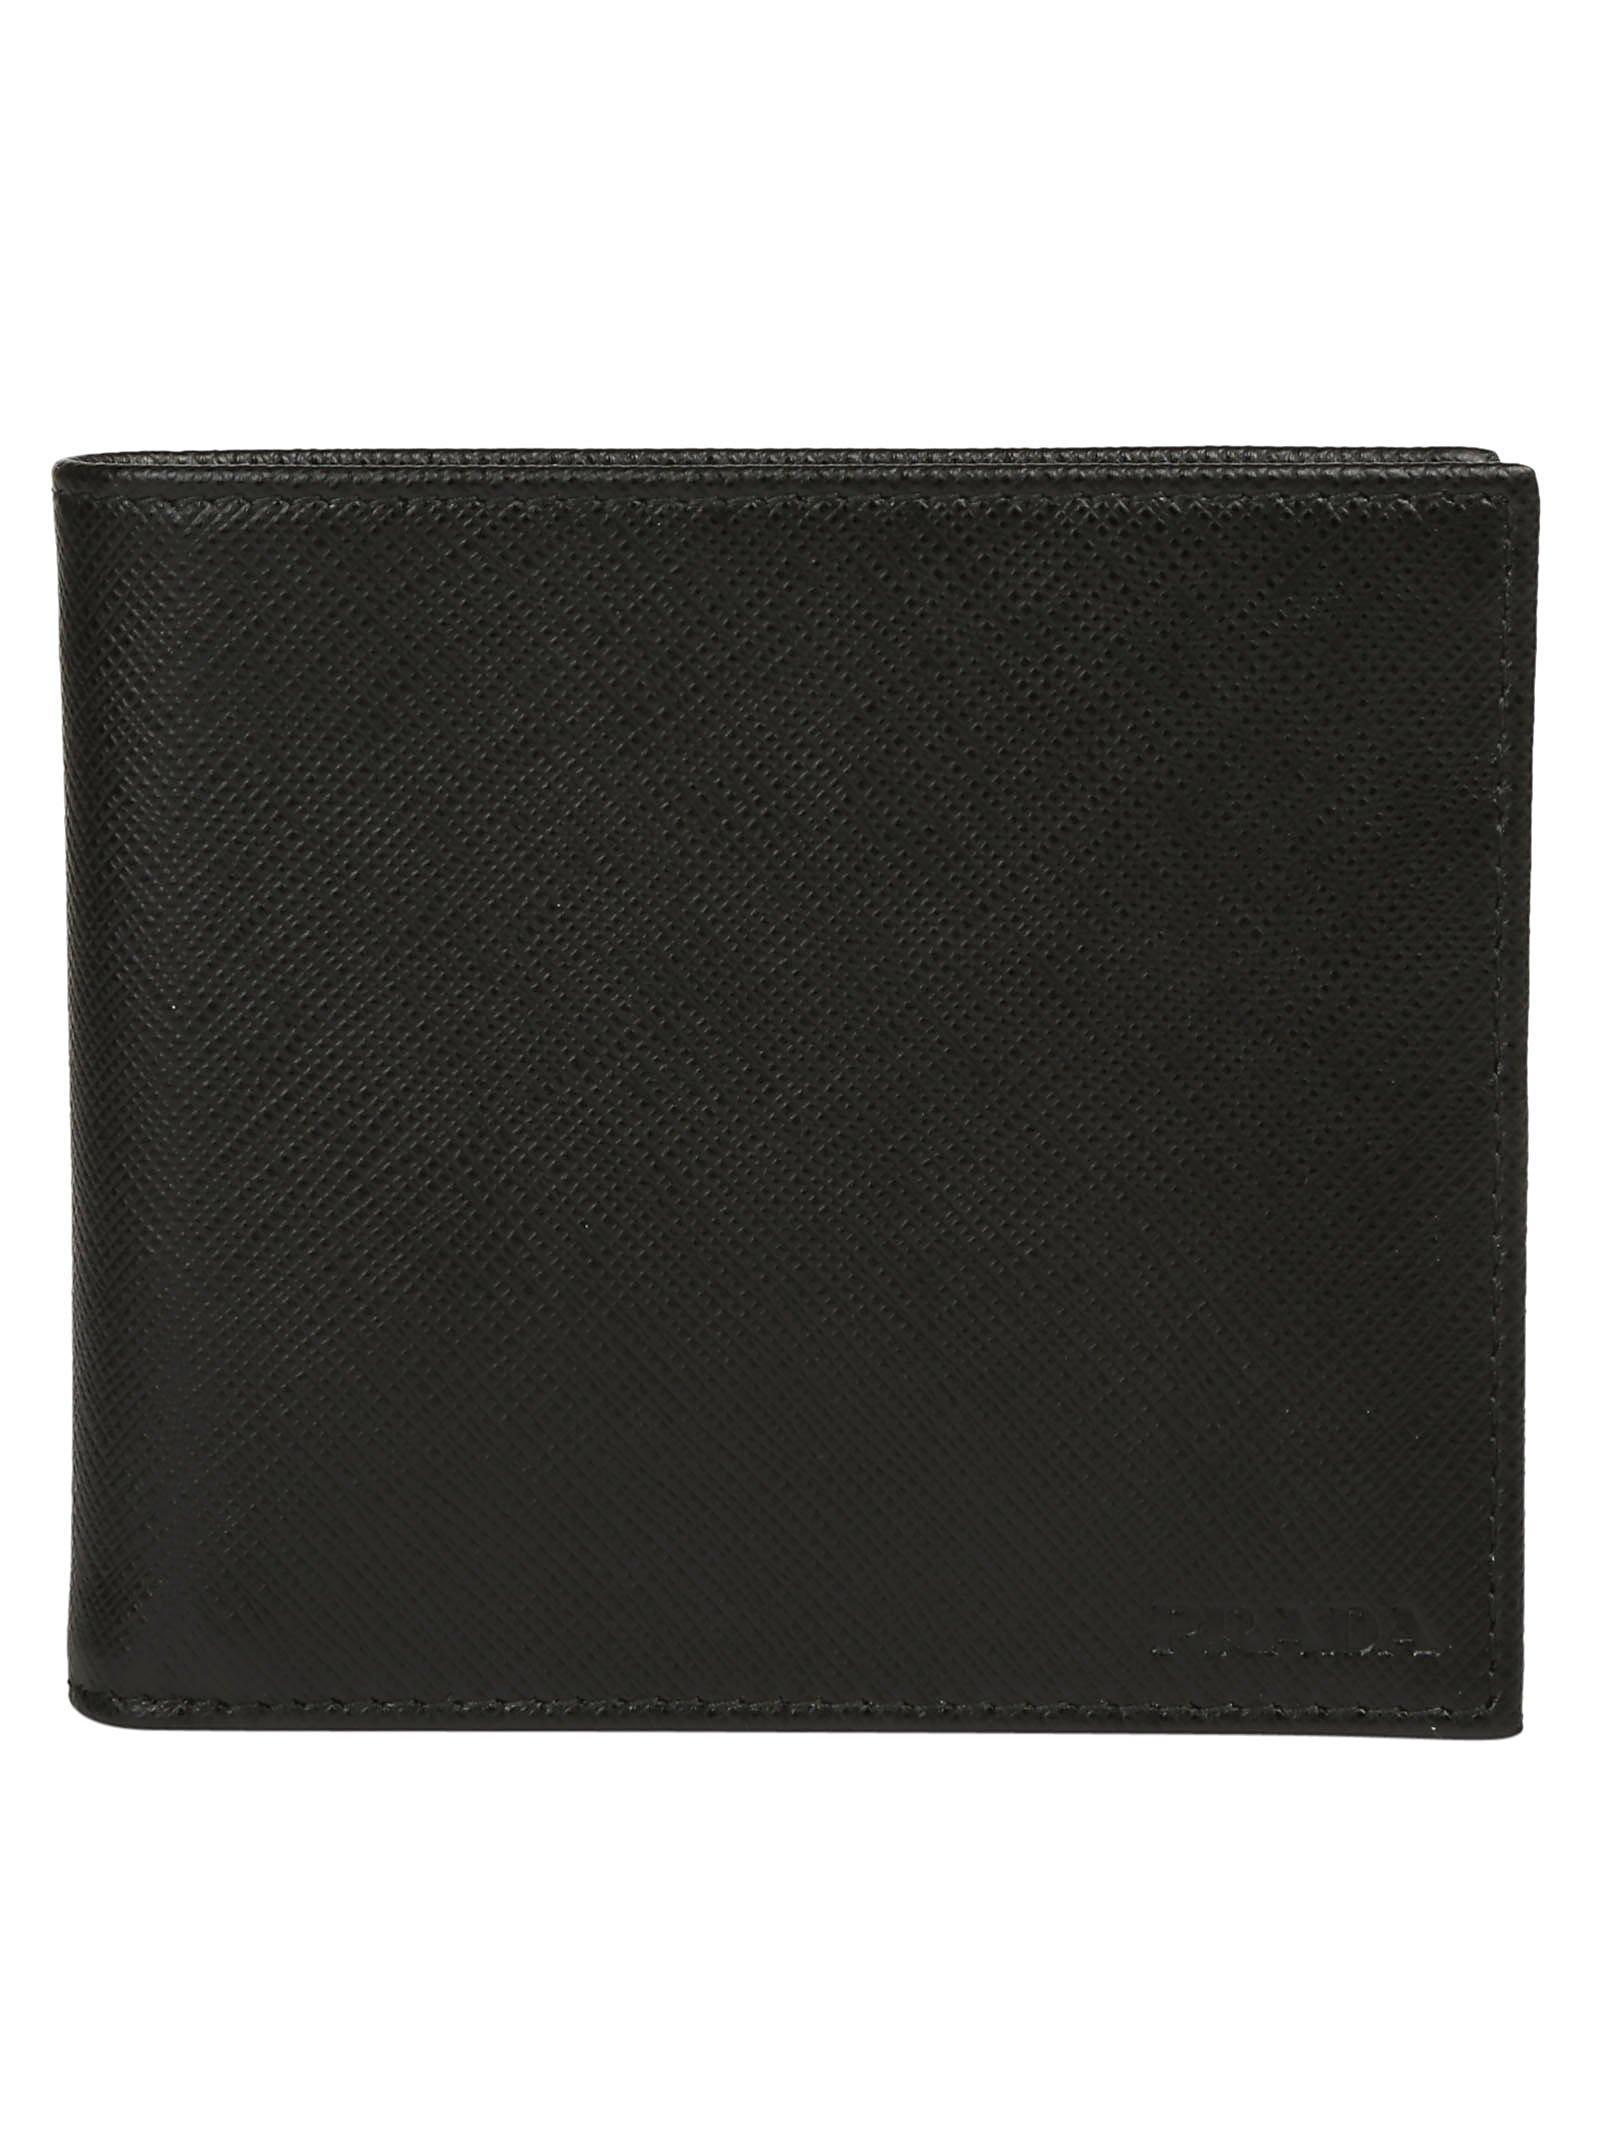 9885ec131536 Prada Embossed Logo Bifold Wallet In Black | ModeSens